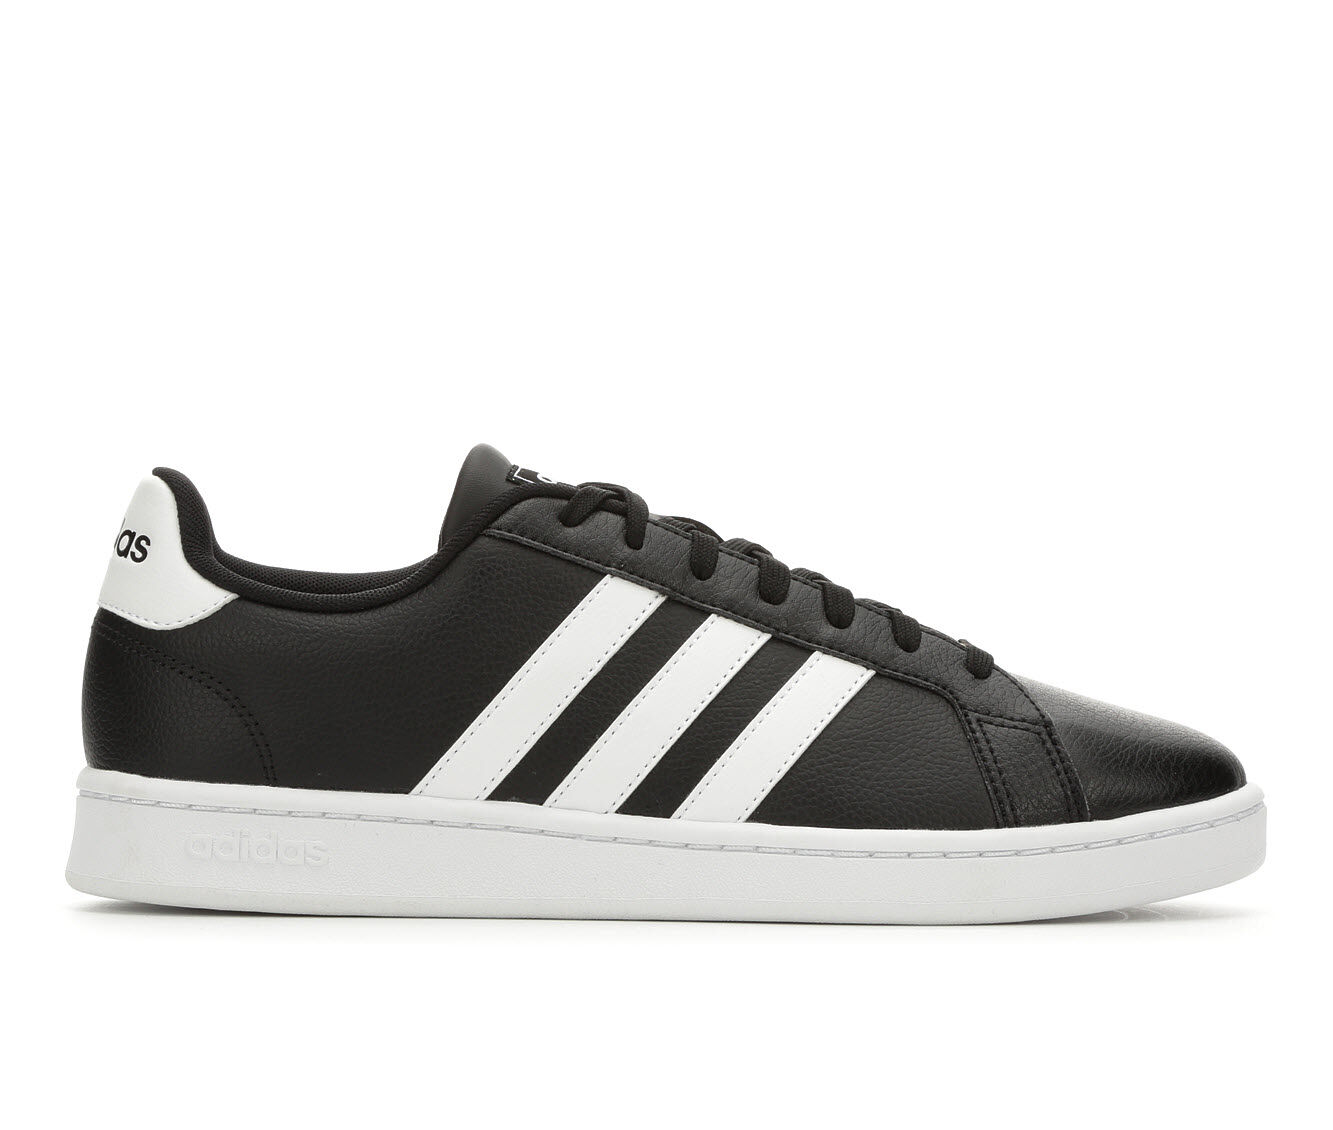 Price Down Men's Adidas Grand Court Retro Sneakers Blk/Wht